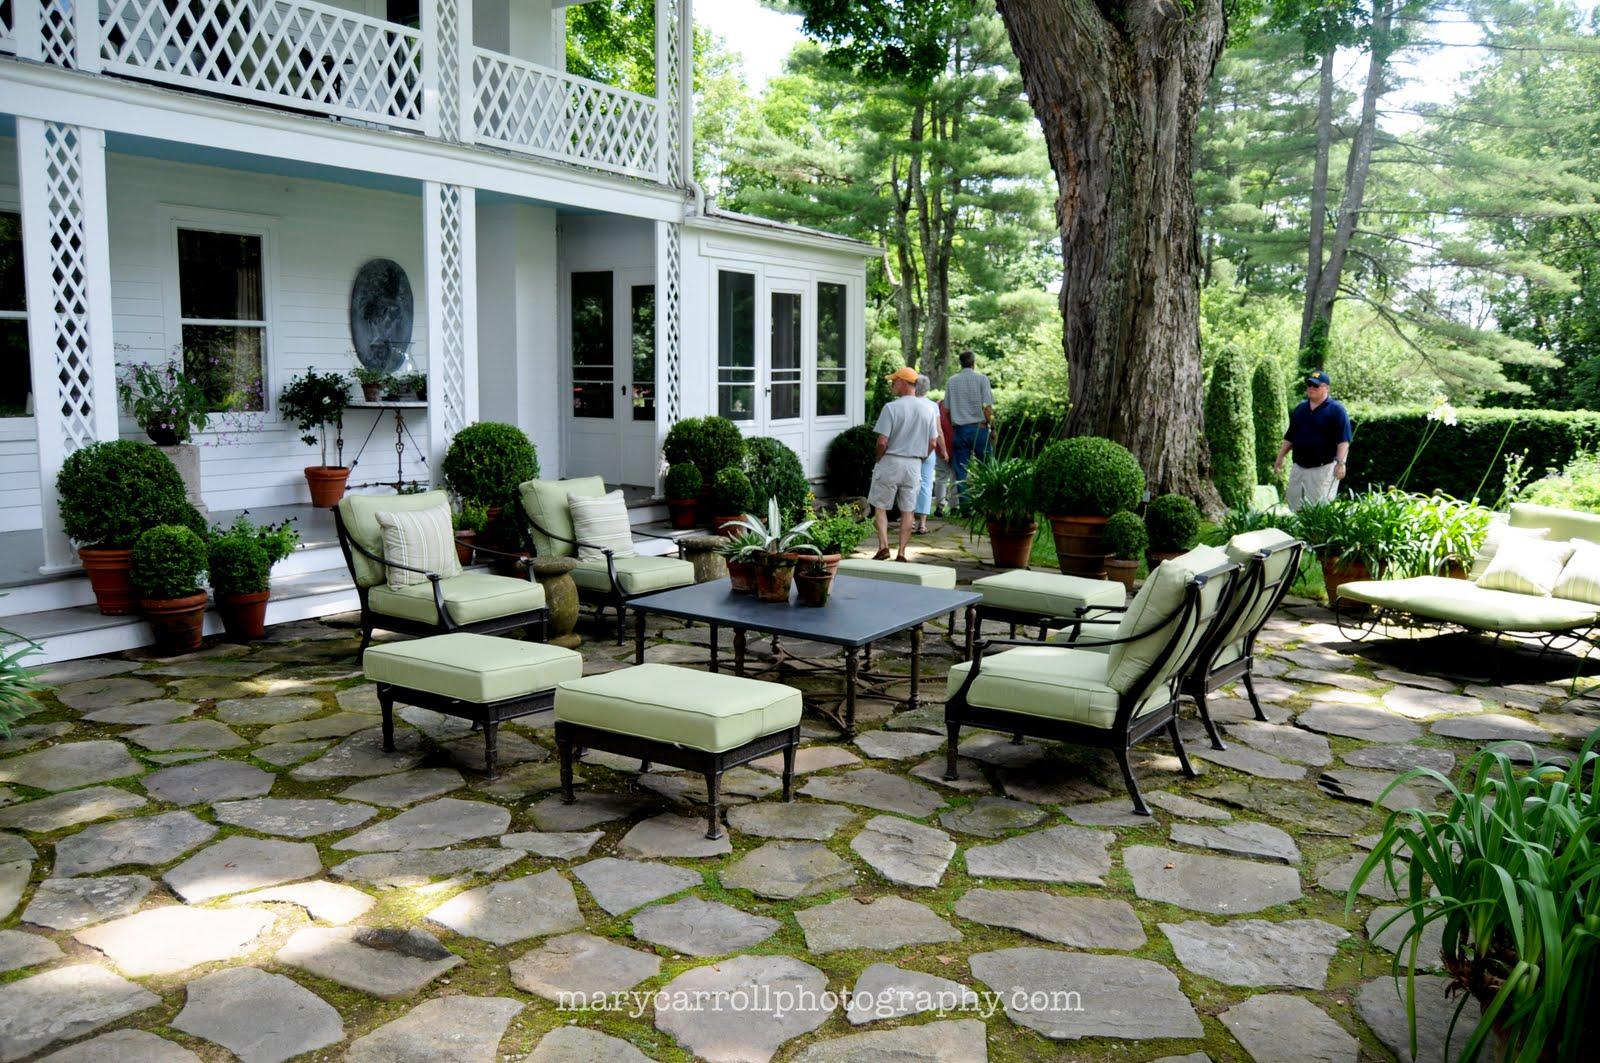 Little Red House Mosaic Monday Garden FurnitureBunny Williams